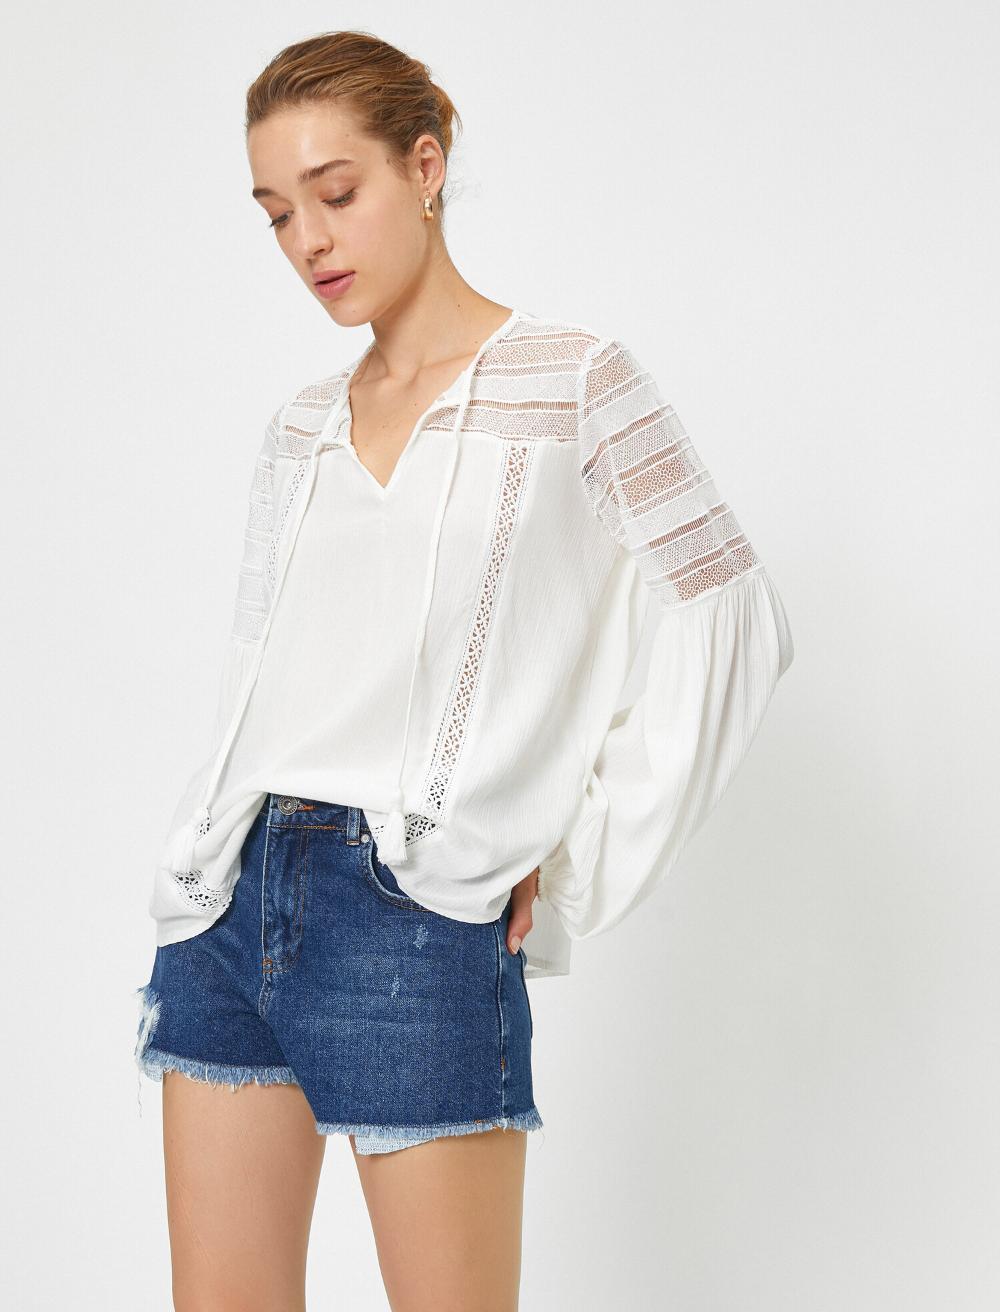 Dantel Detayli Uzun Kol Bluz In 2020 Fashion Women Ruffle Blouse